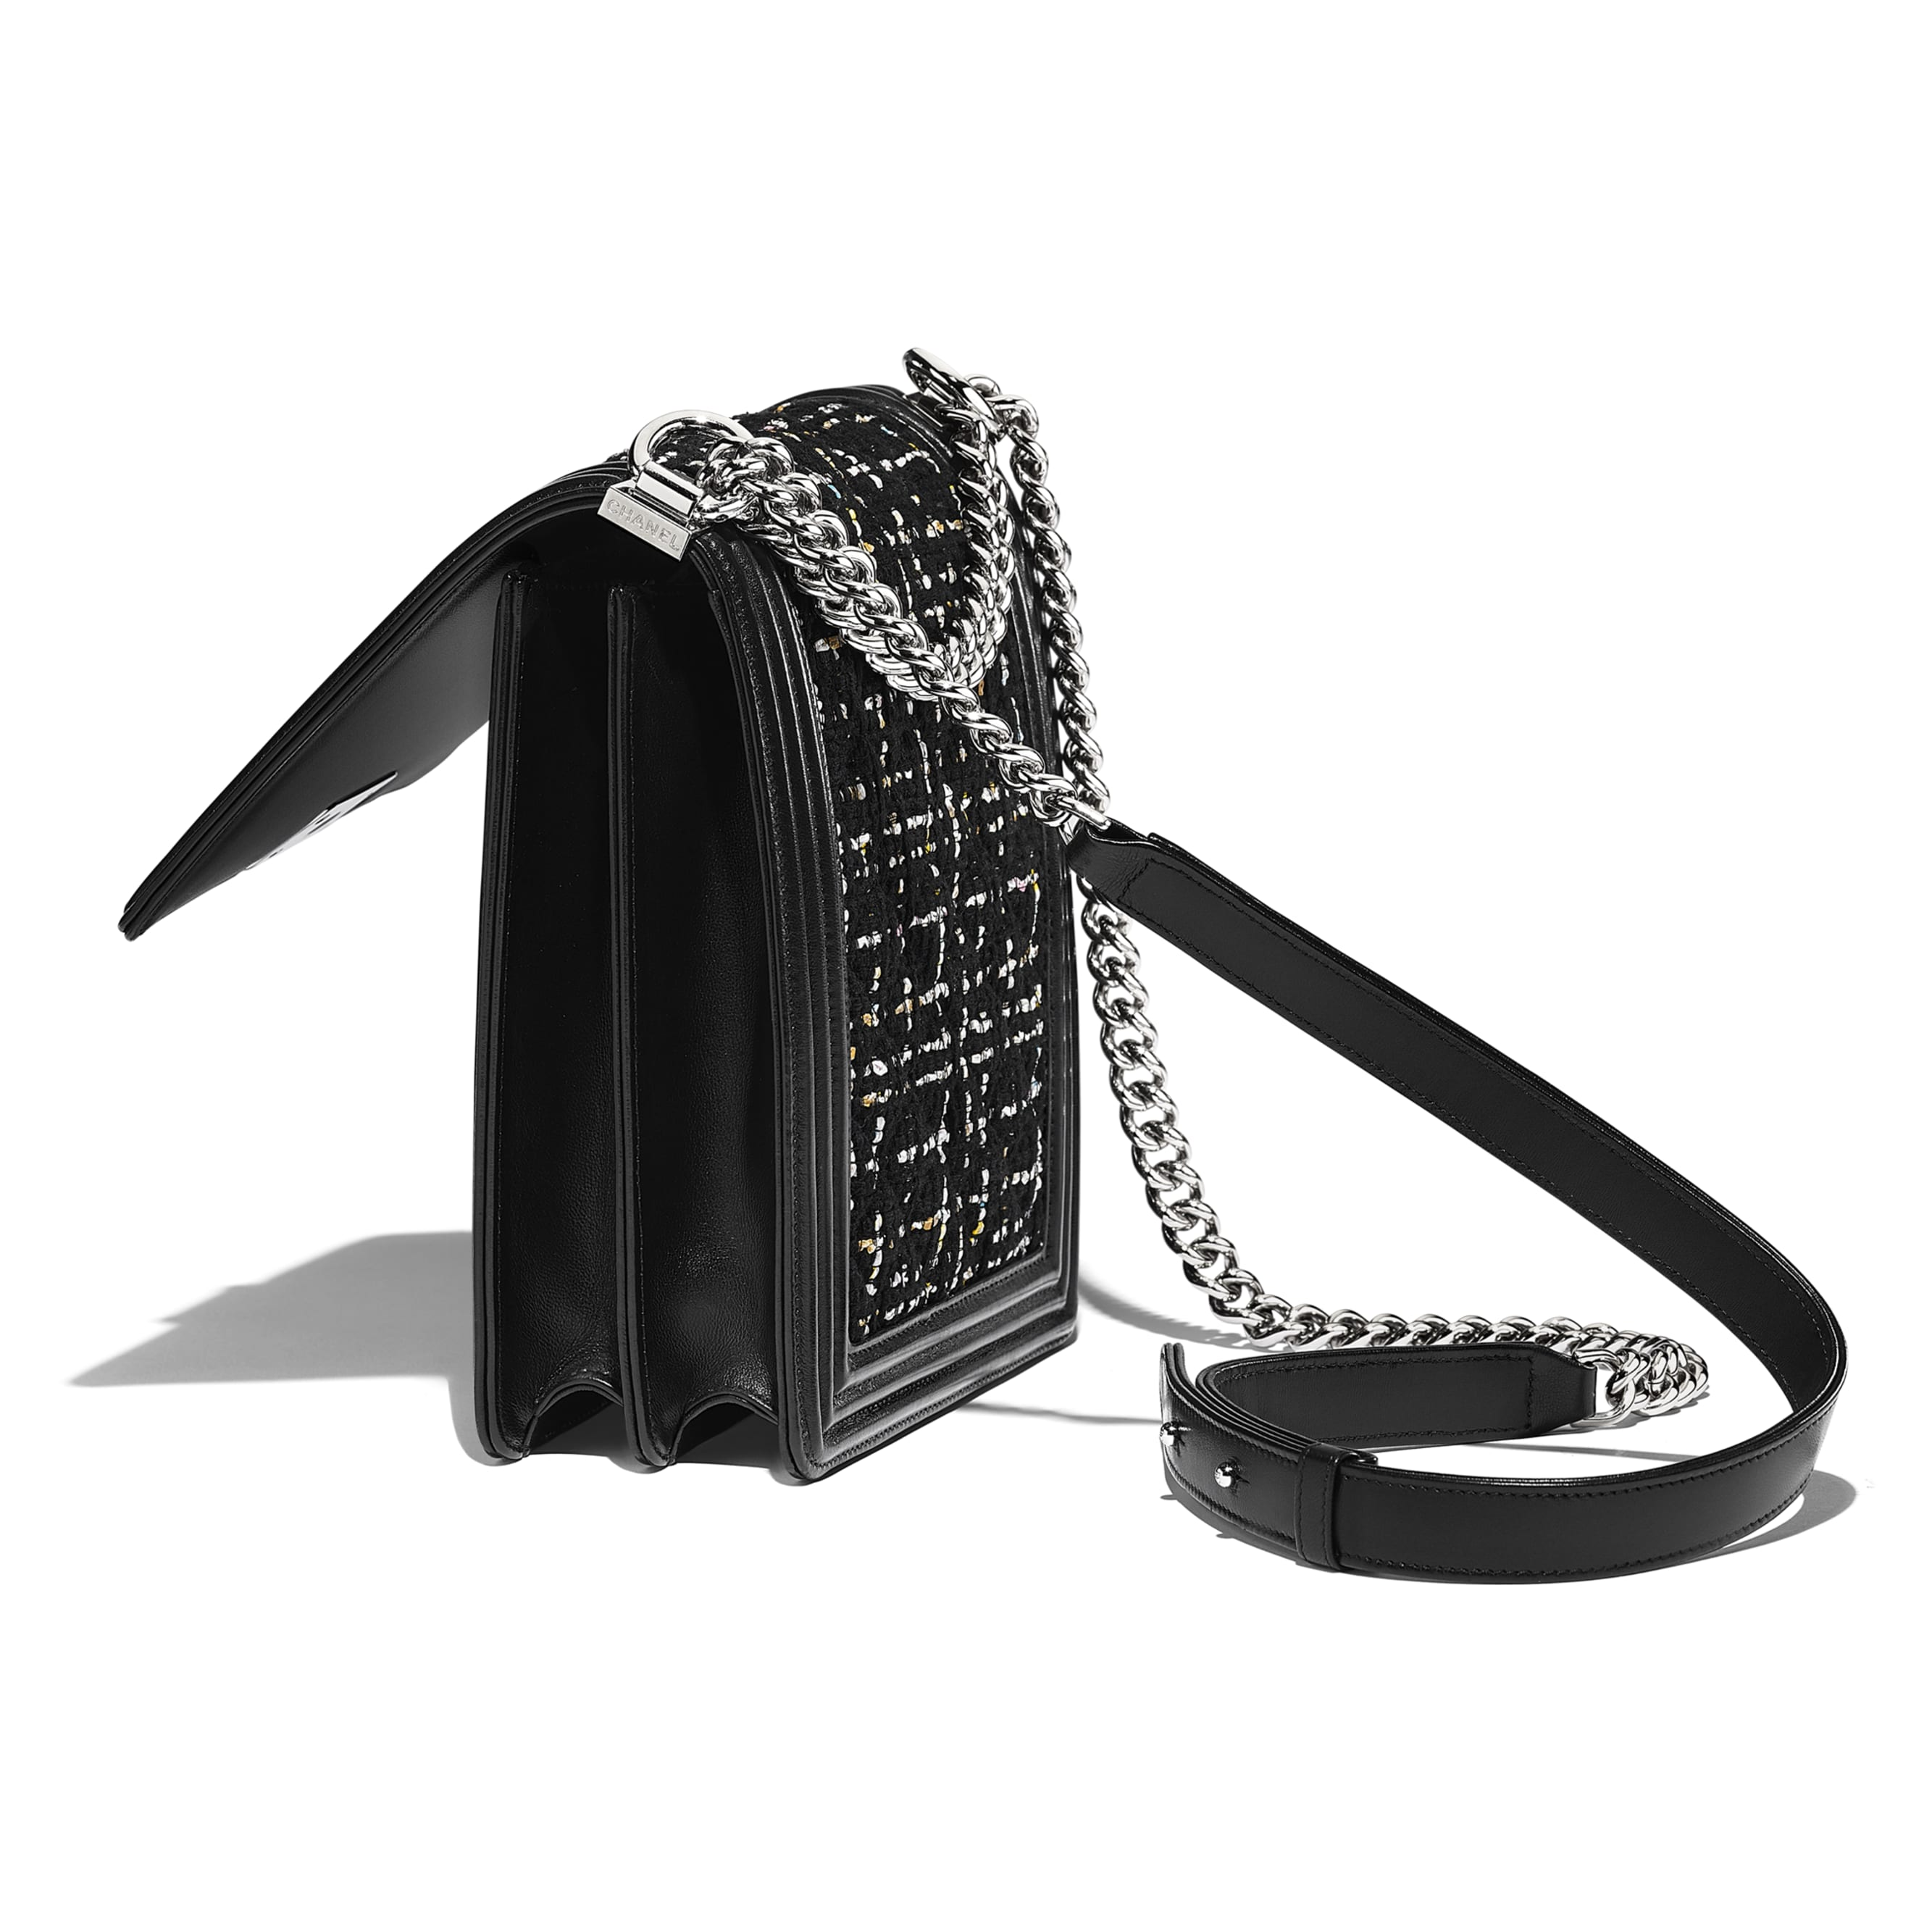 BOY CHANEL Handbag - Black, White, Pink & Yellow - Tweed, Calfskin & Silver-Tone Metal - Other view - see standard sized version